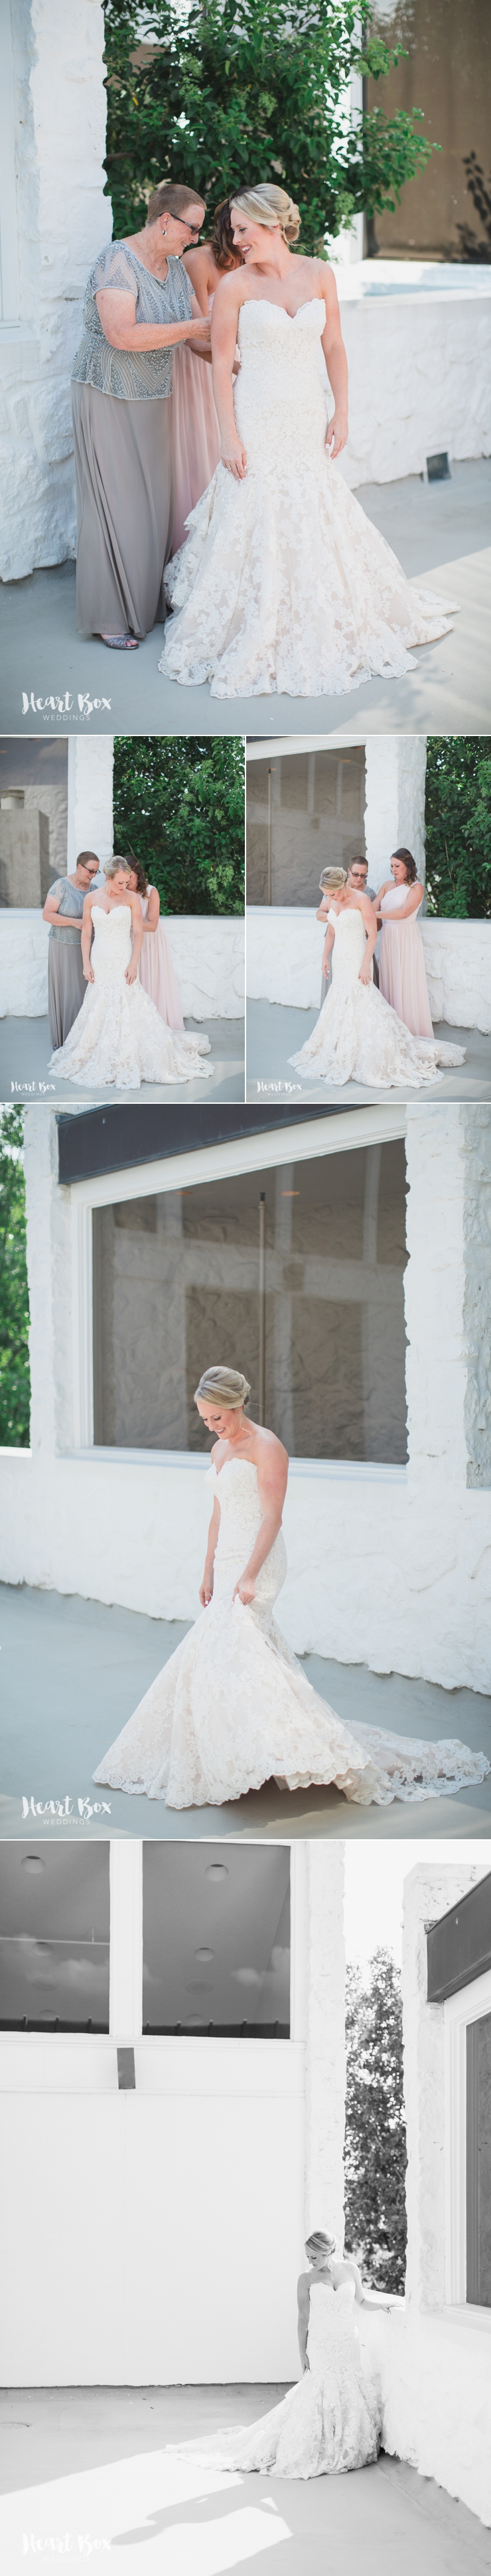 Alcala Wedding 5.jpg